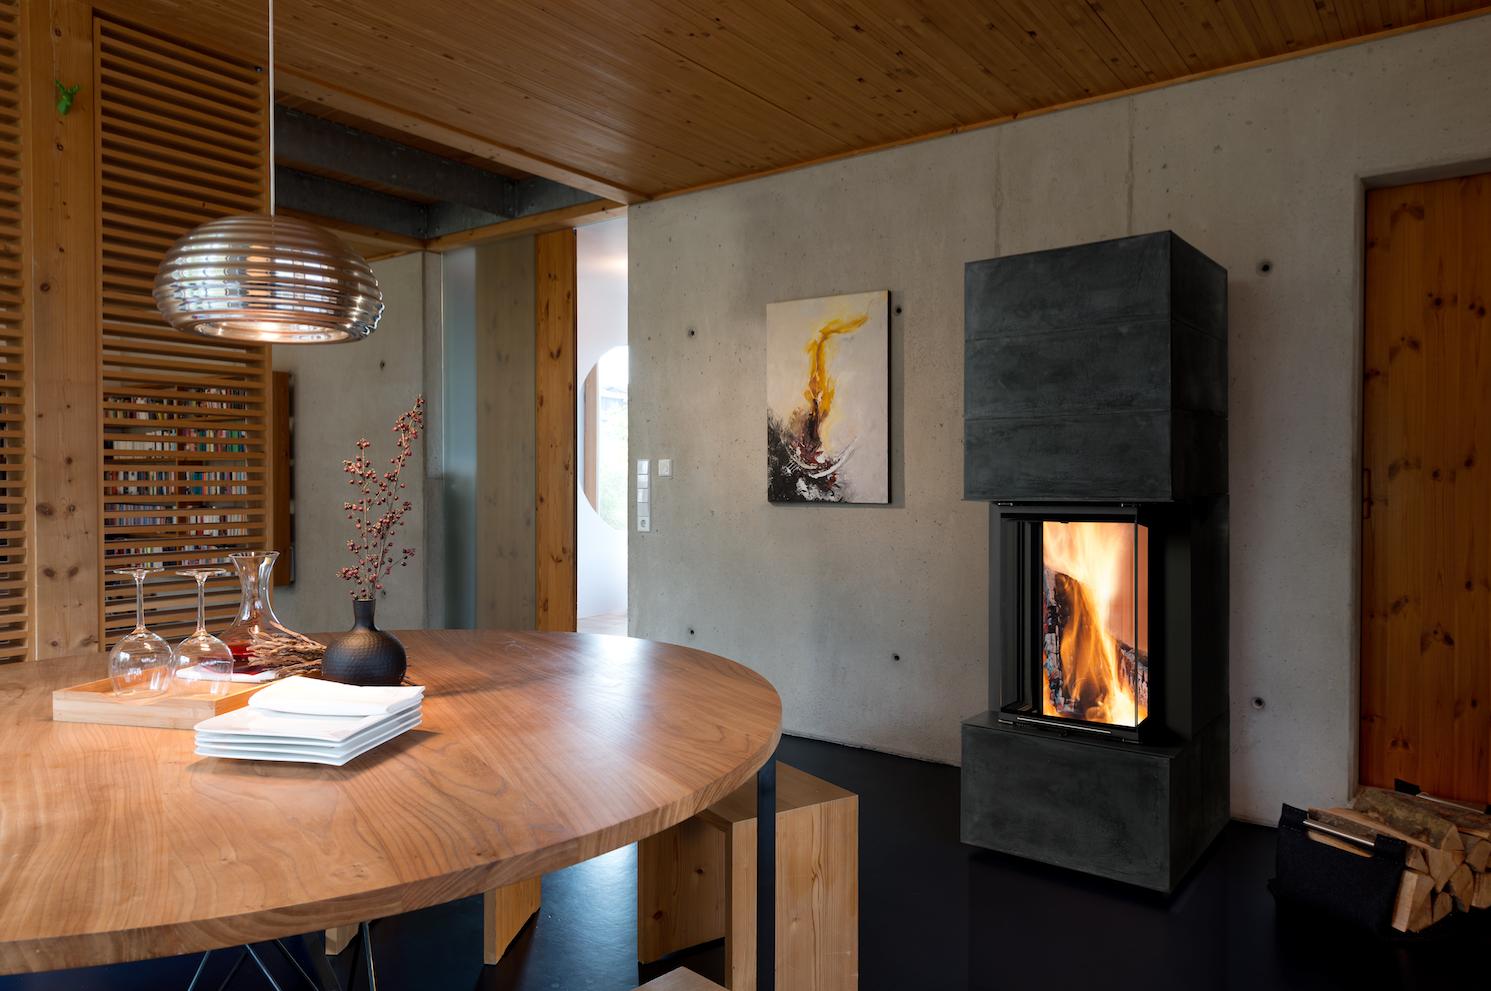 brunner accumulerende haard bsk 11 by pierres d henri houtkachels haarden pinterest. Black Bedroom Furniture Sets. Home Design Ideas